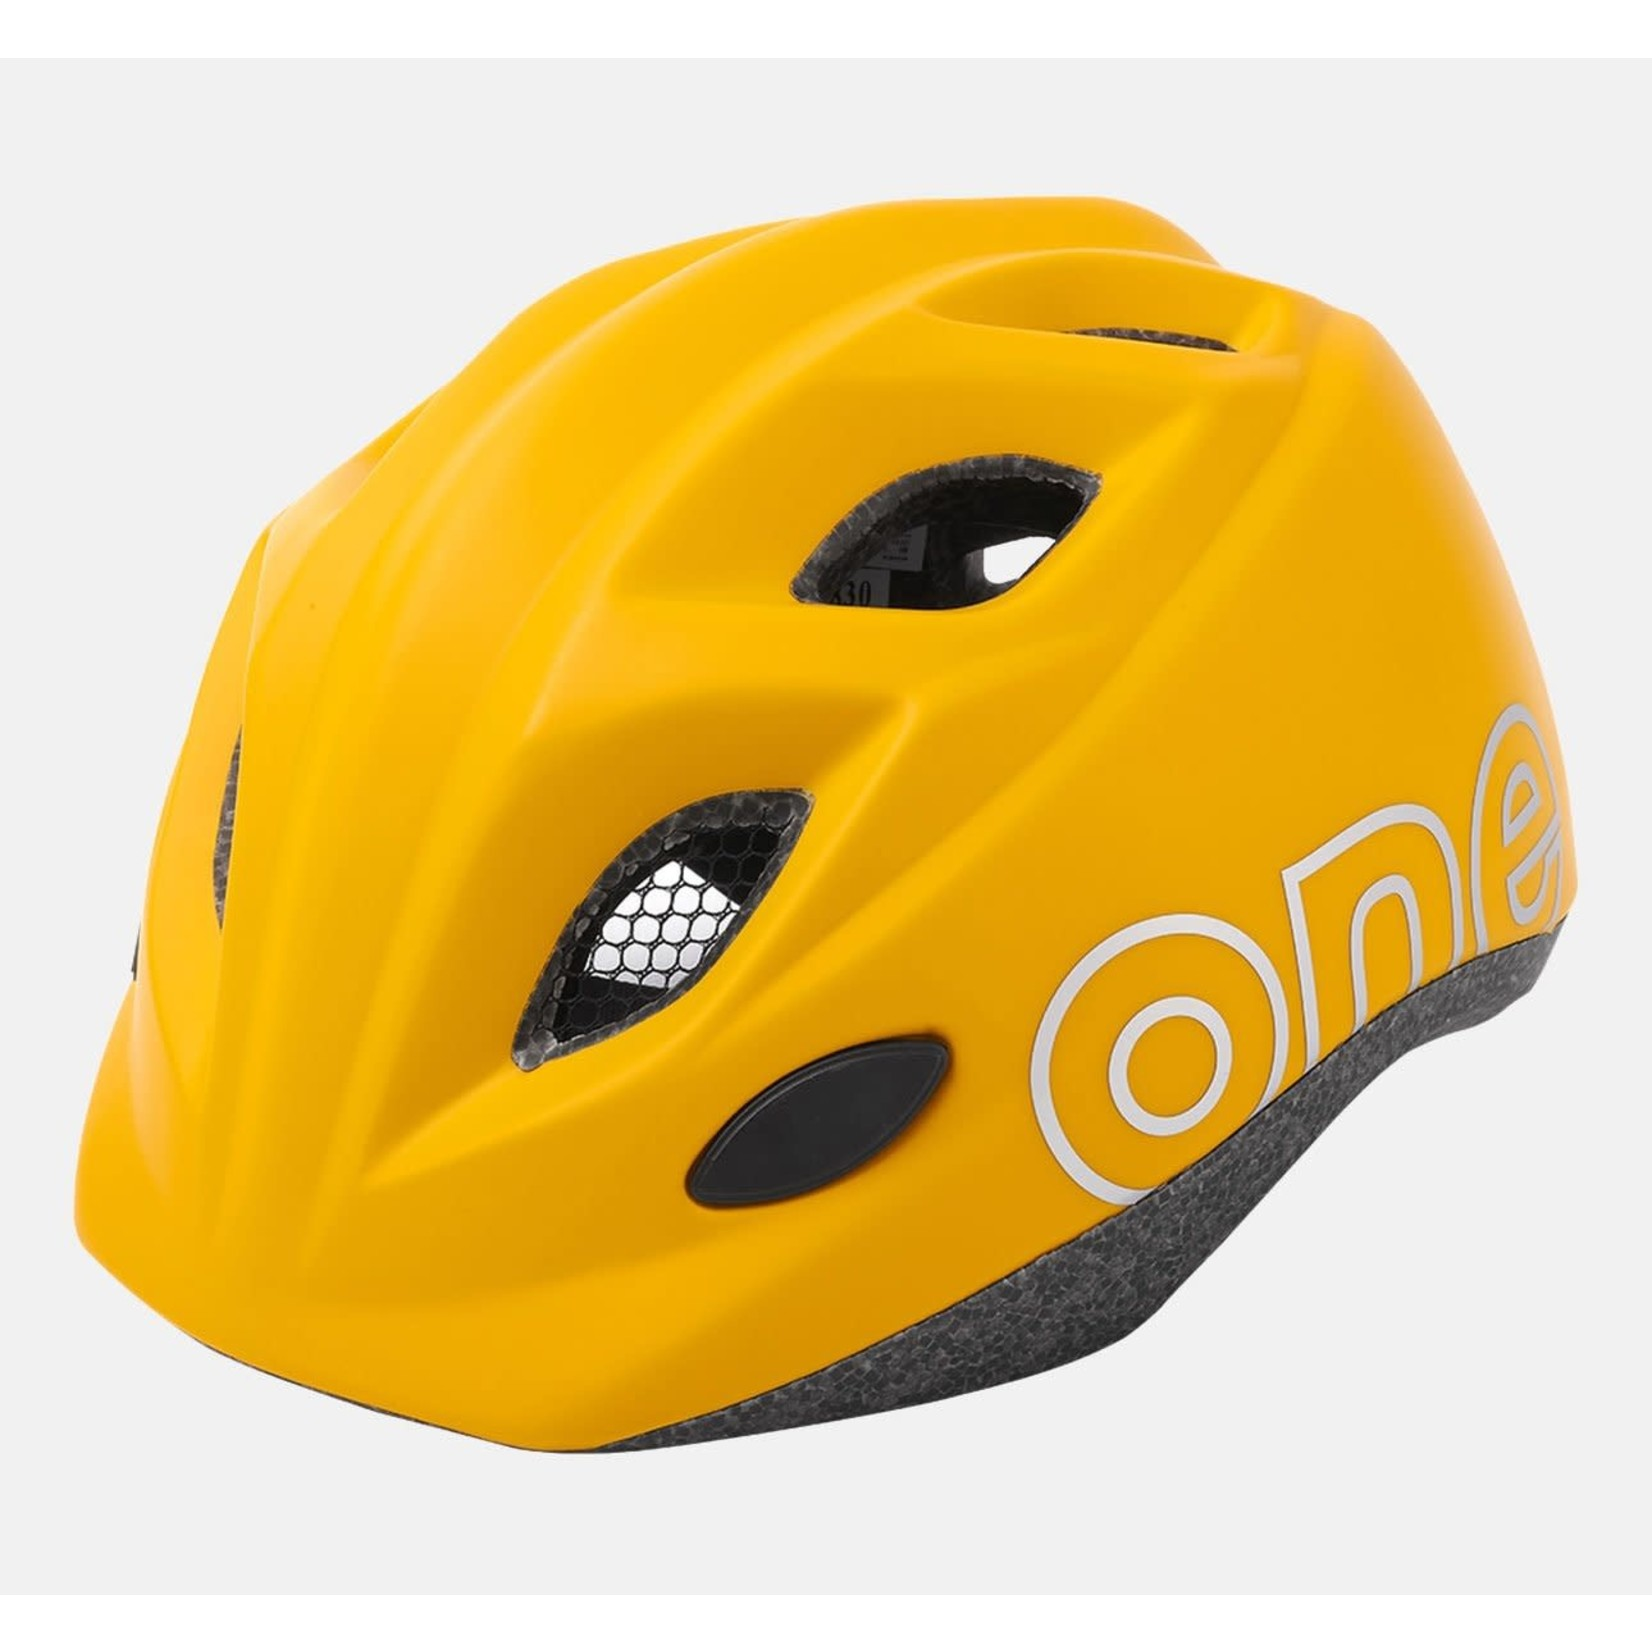 Bobike Bobike One Plus Baby/Toddler Helmet